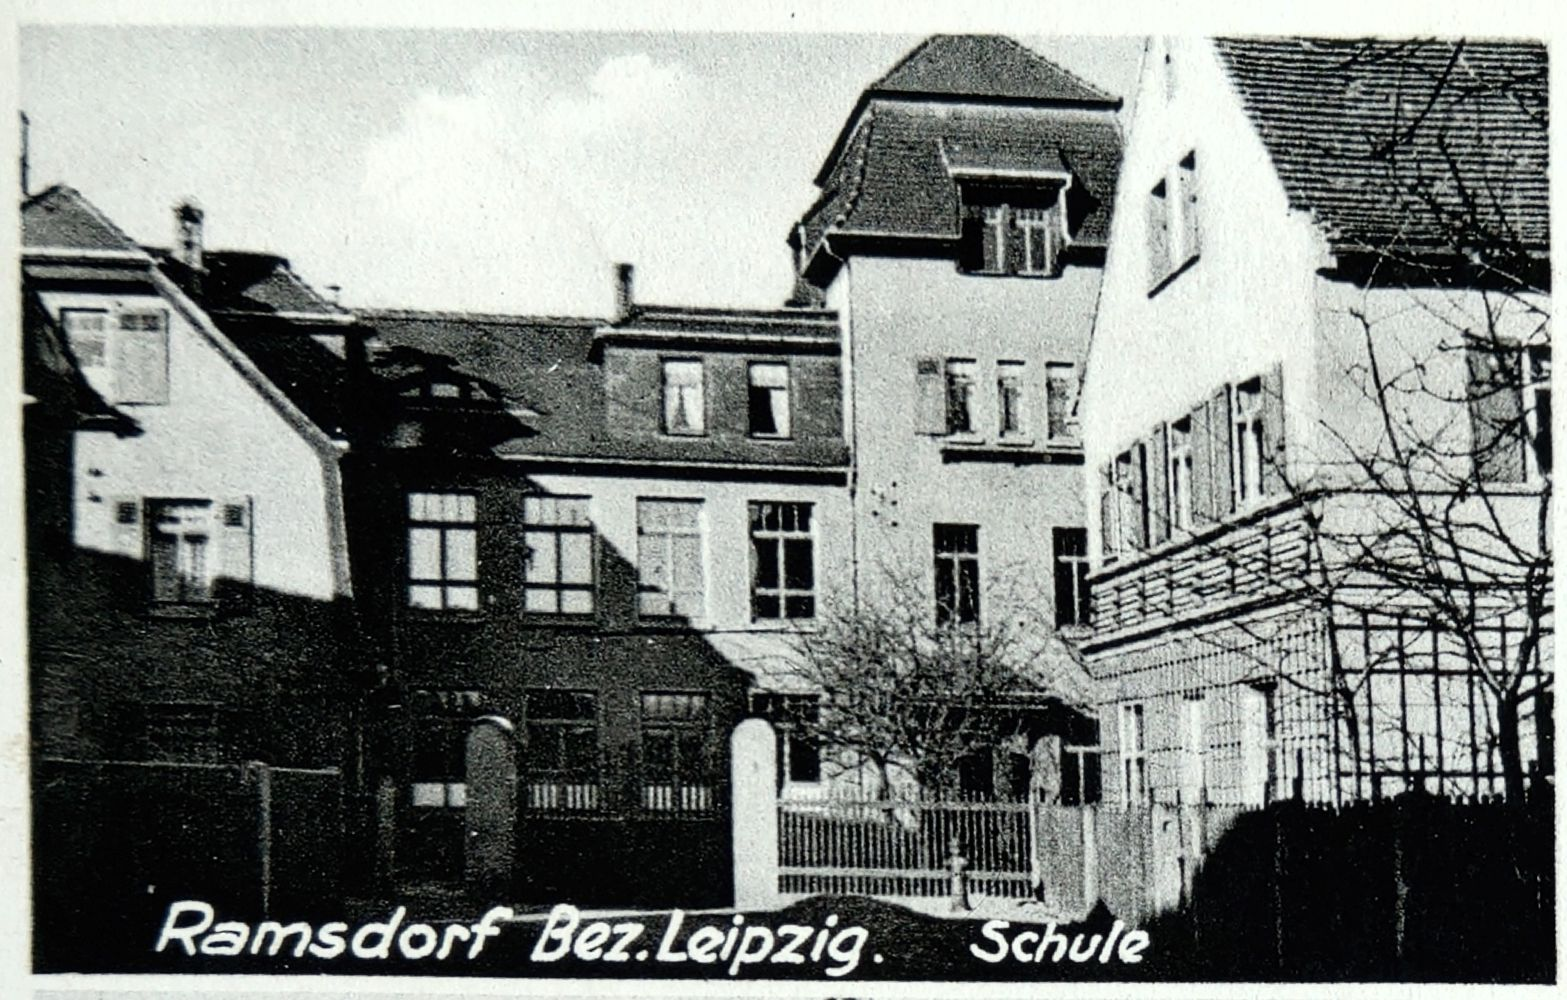 Schule Ramsdorf